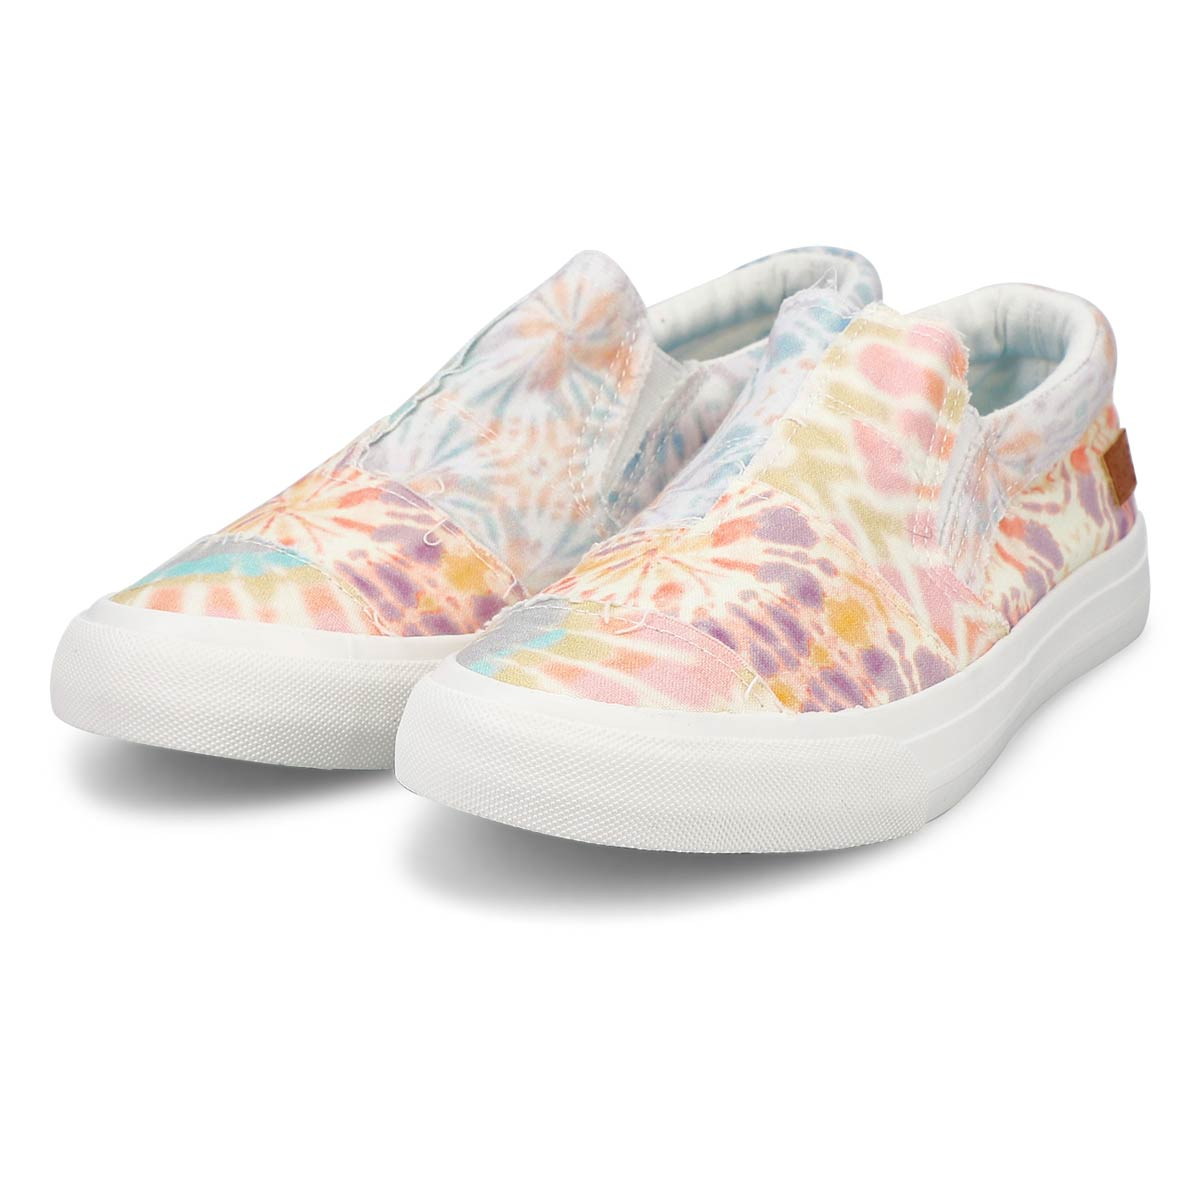 Women's Maddox Fashion Sneaker - Sandstone